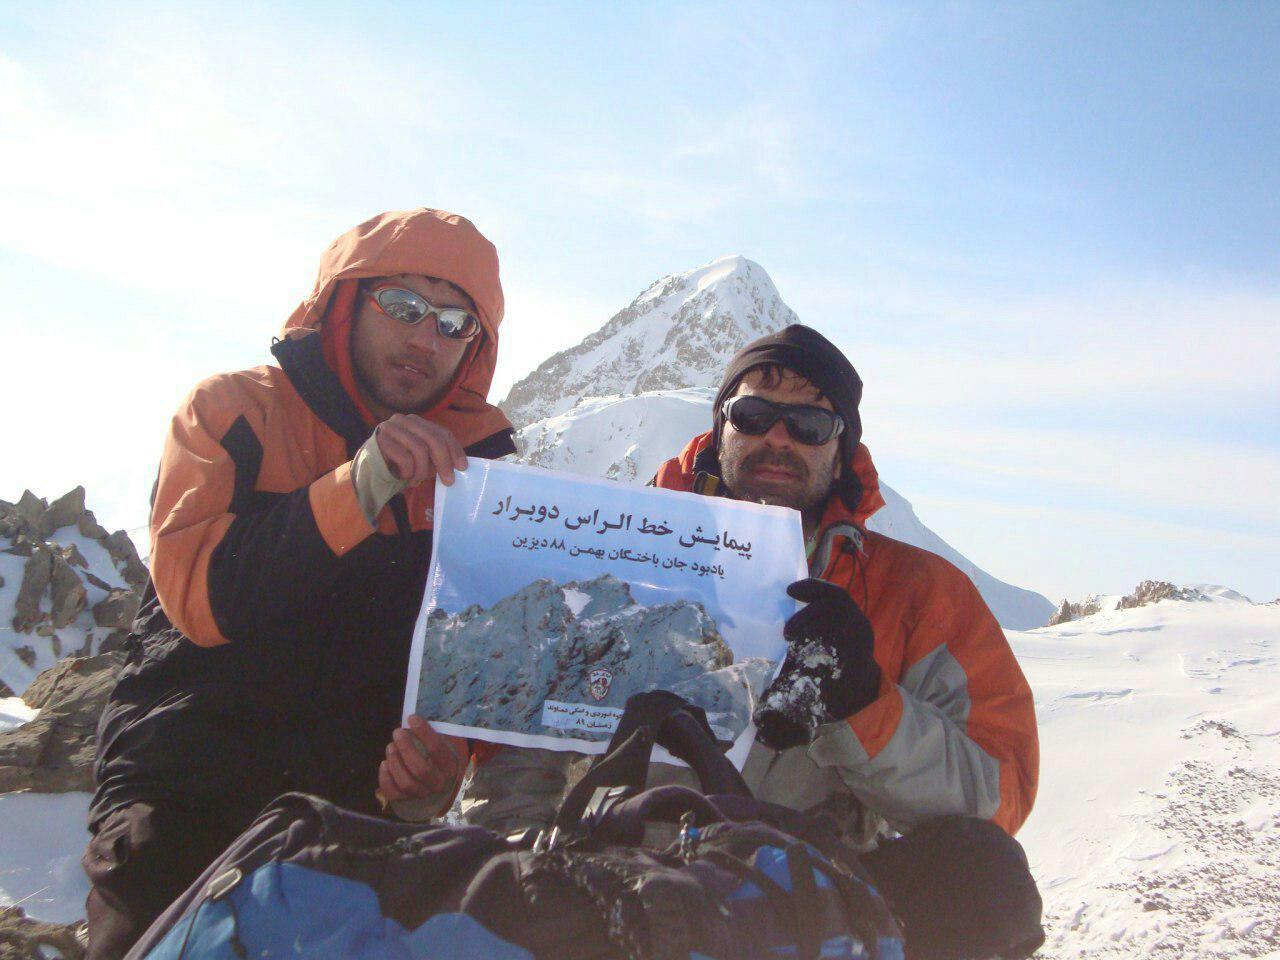 گزارش پیمایش زمستانه خط الراس دوبرار توسط کوروش نگهبان و زنده یاد پویا کیوان